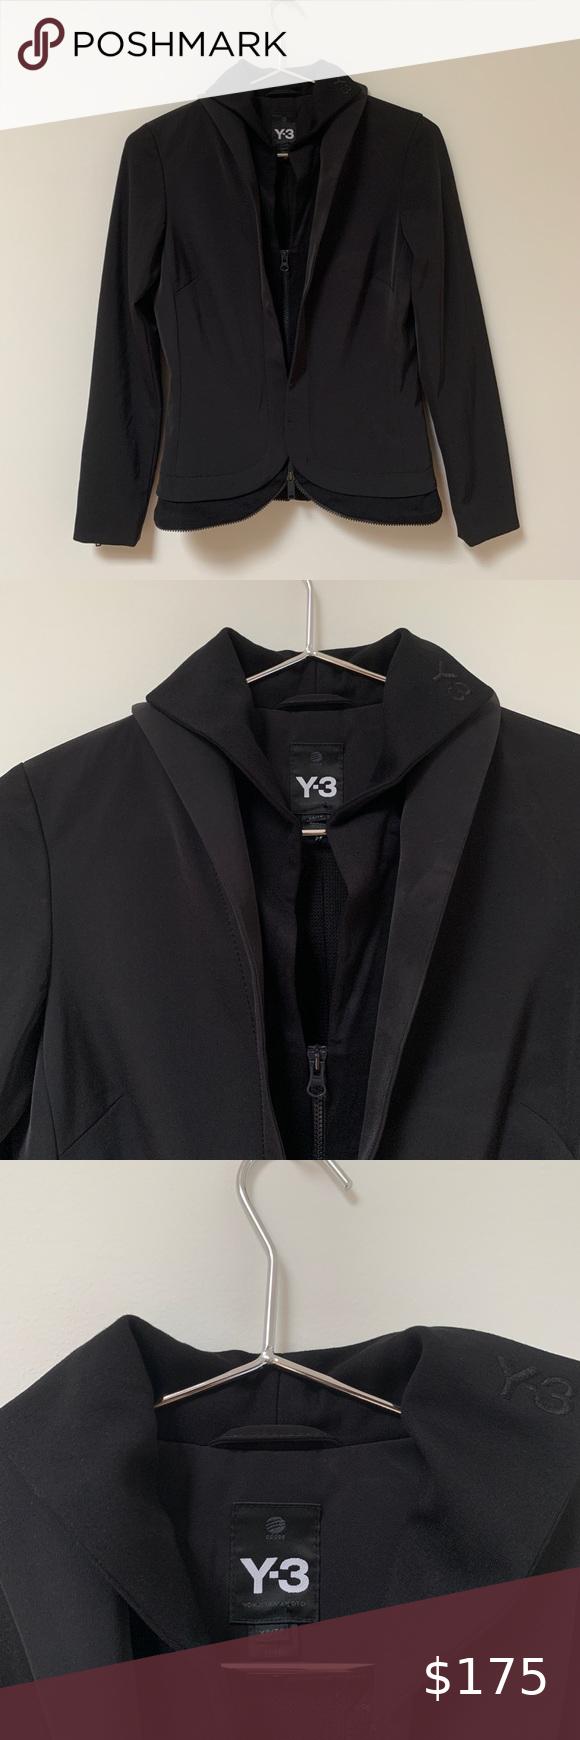 Y3 X Adidas Jacket Yohji Yamamoto Sporty Jacket Yohji Yamamoto Clothes Design